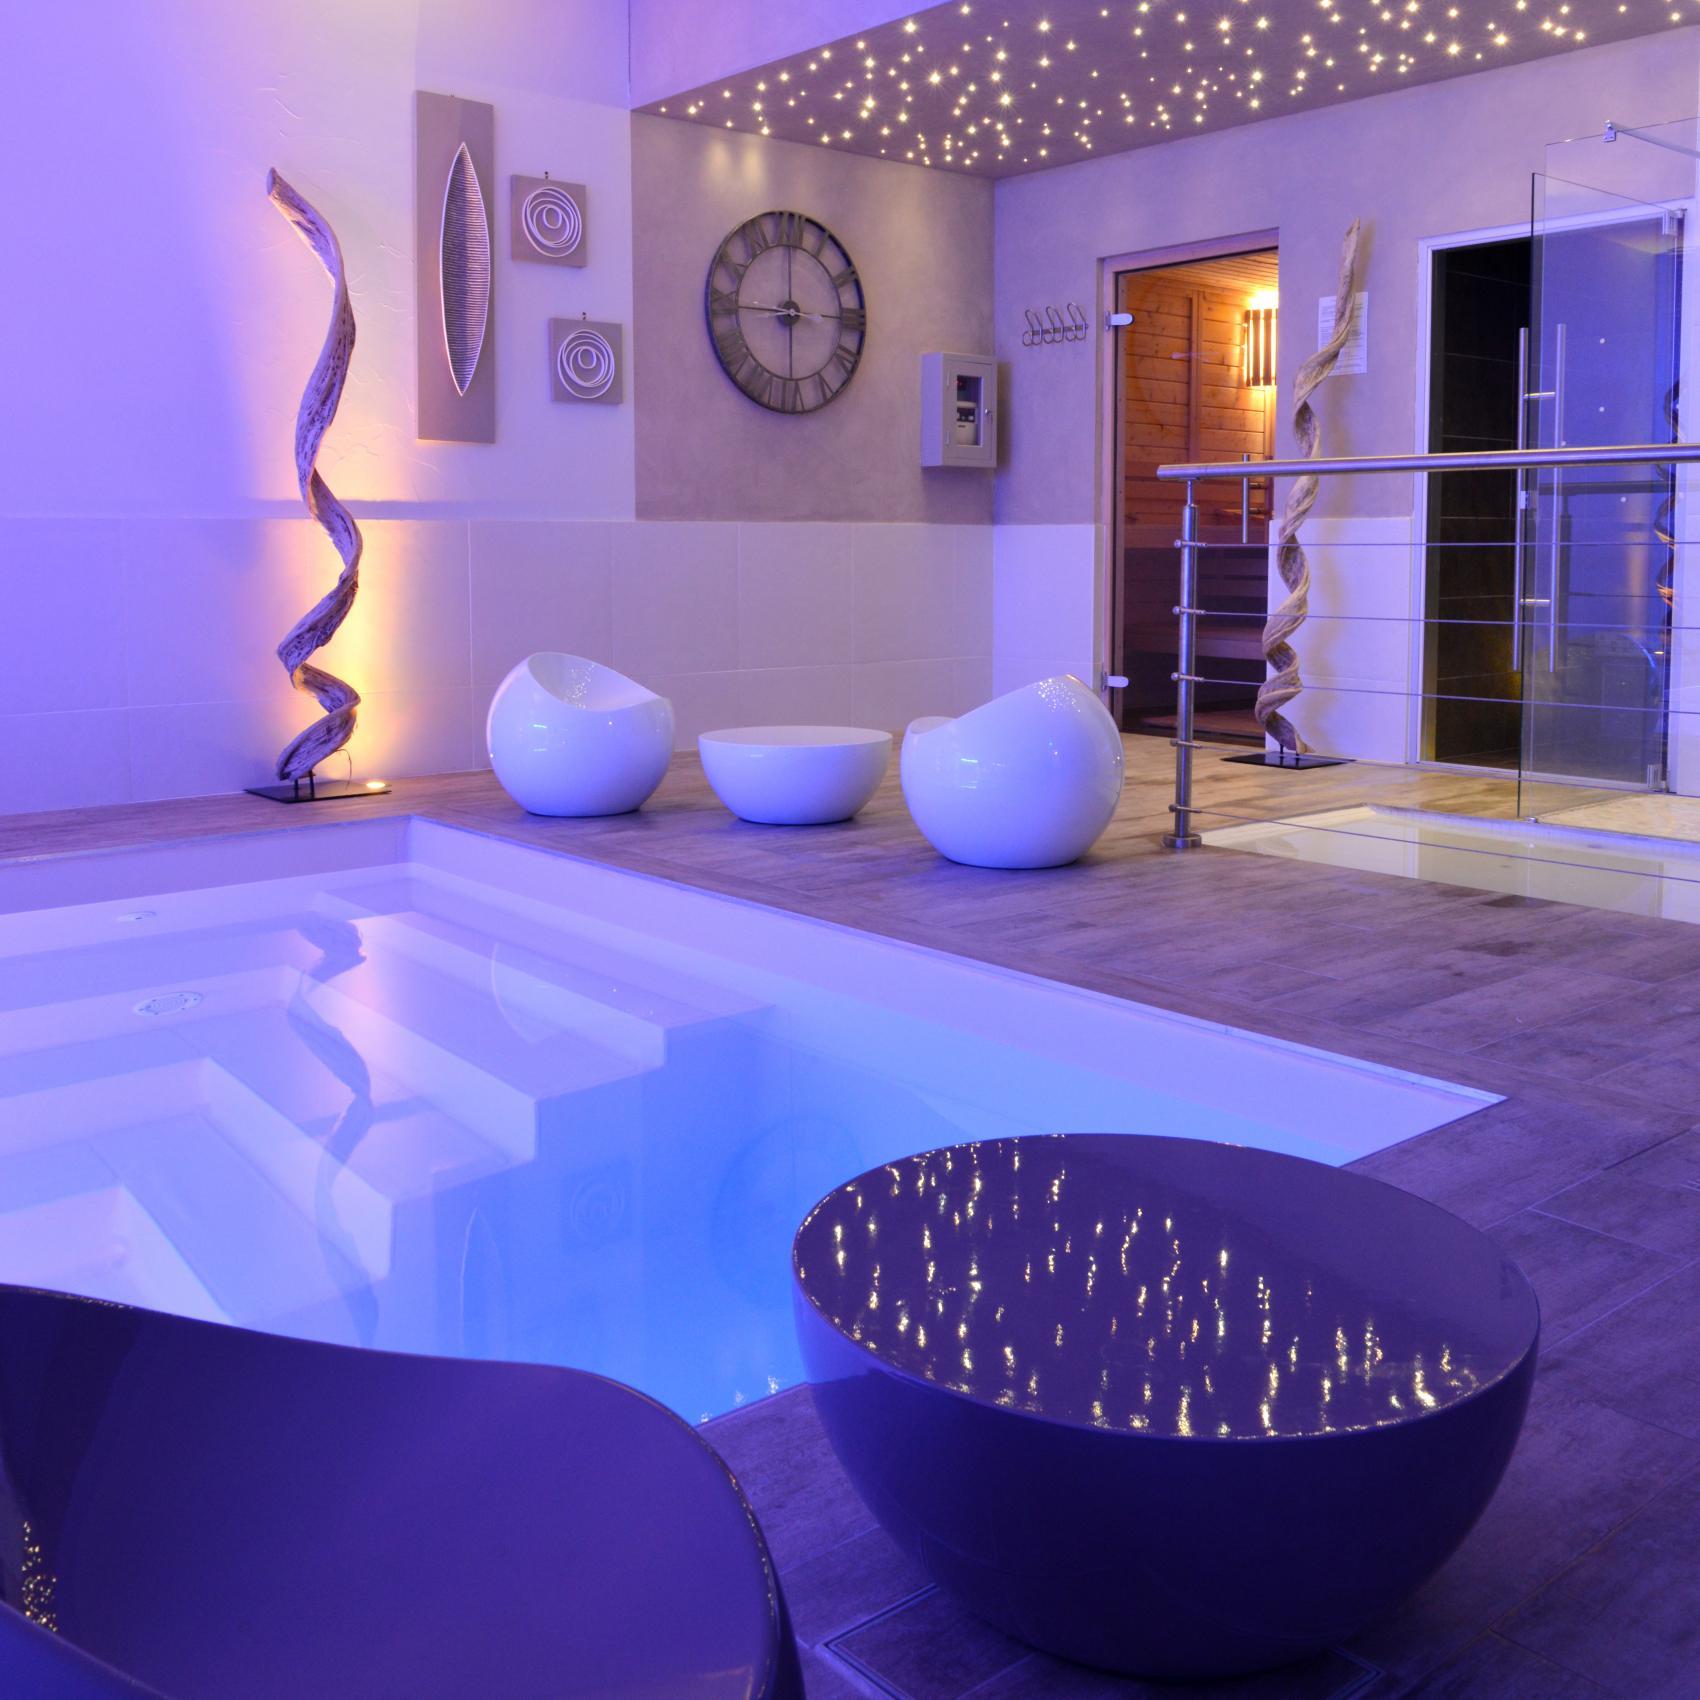 Meilleurs tarifs garantis grand h tel des bains et for Fouras hotel des bains